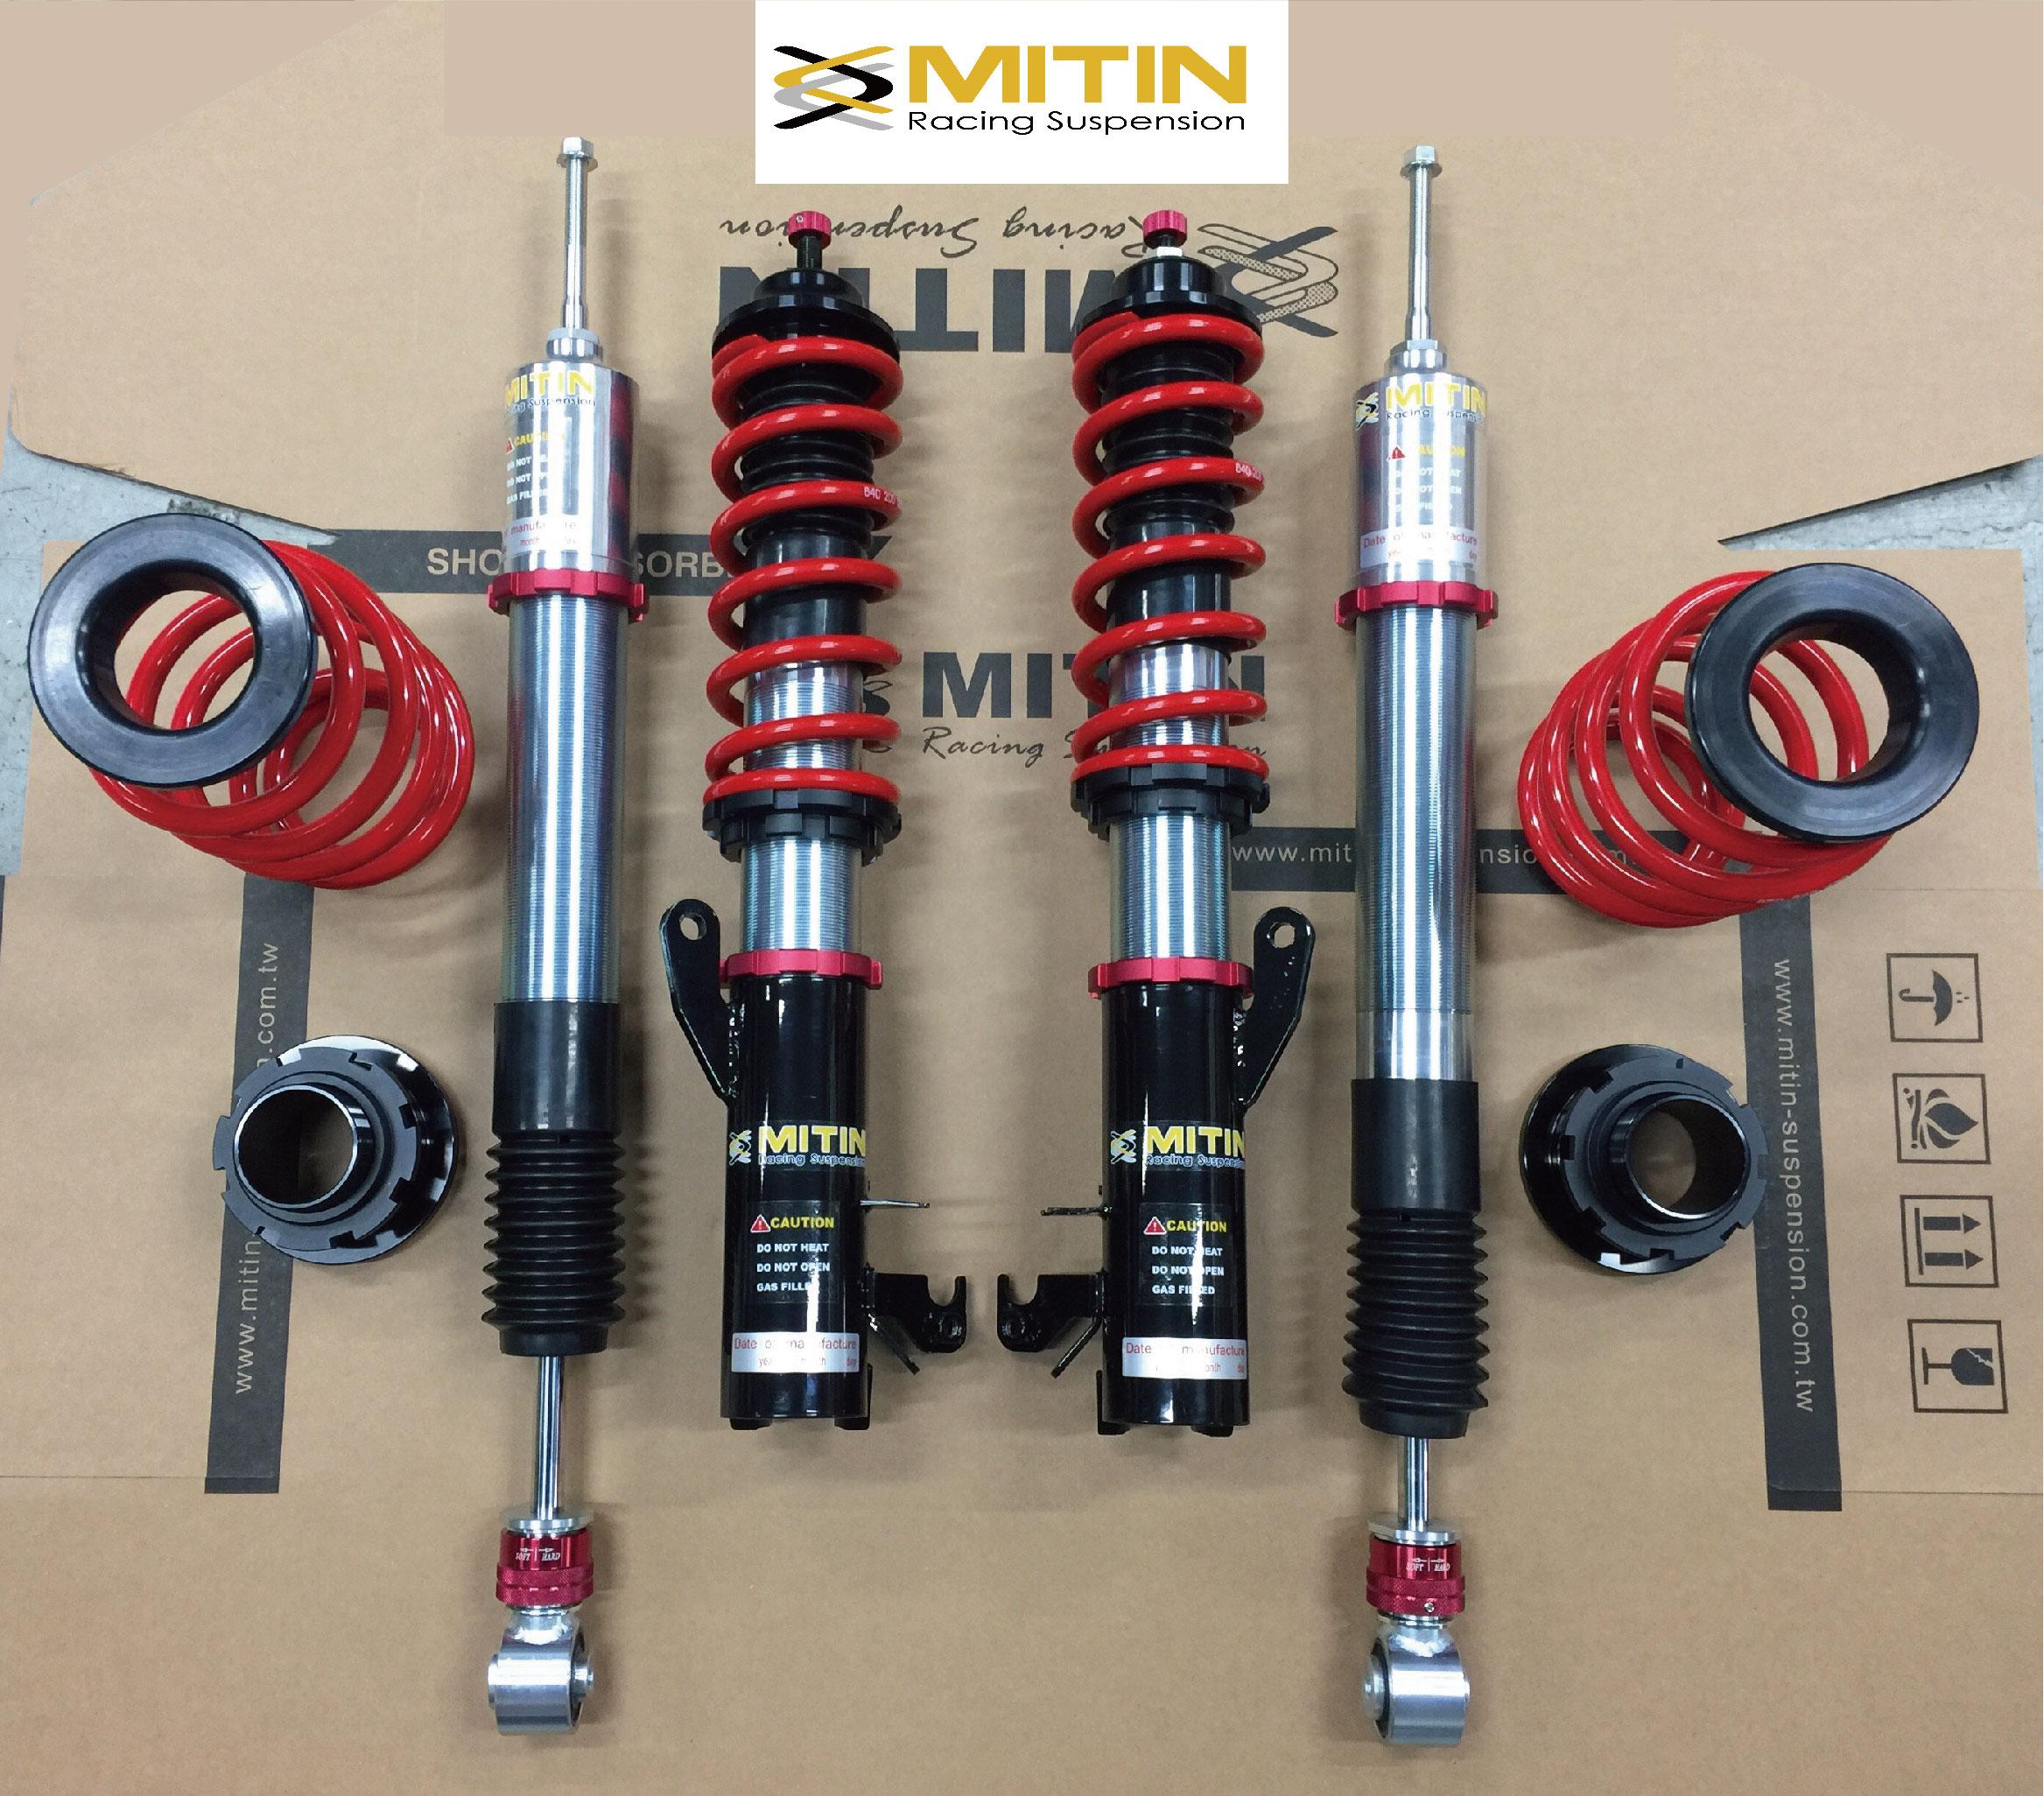 Coilover,Shock absorber,suspension,Honda EK5 Fit2015避震器,底盤配件,汽車改裝零件,懸吊系統